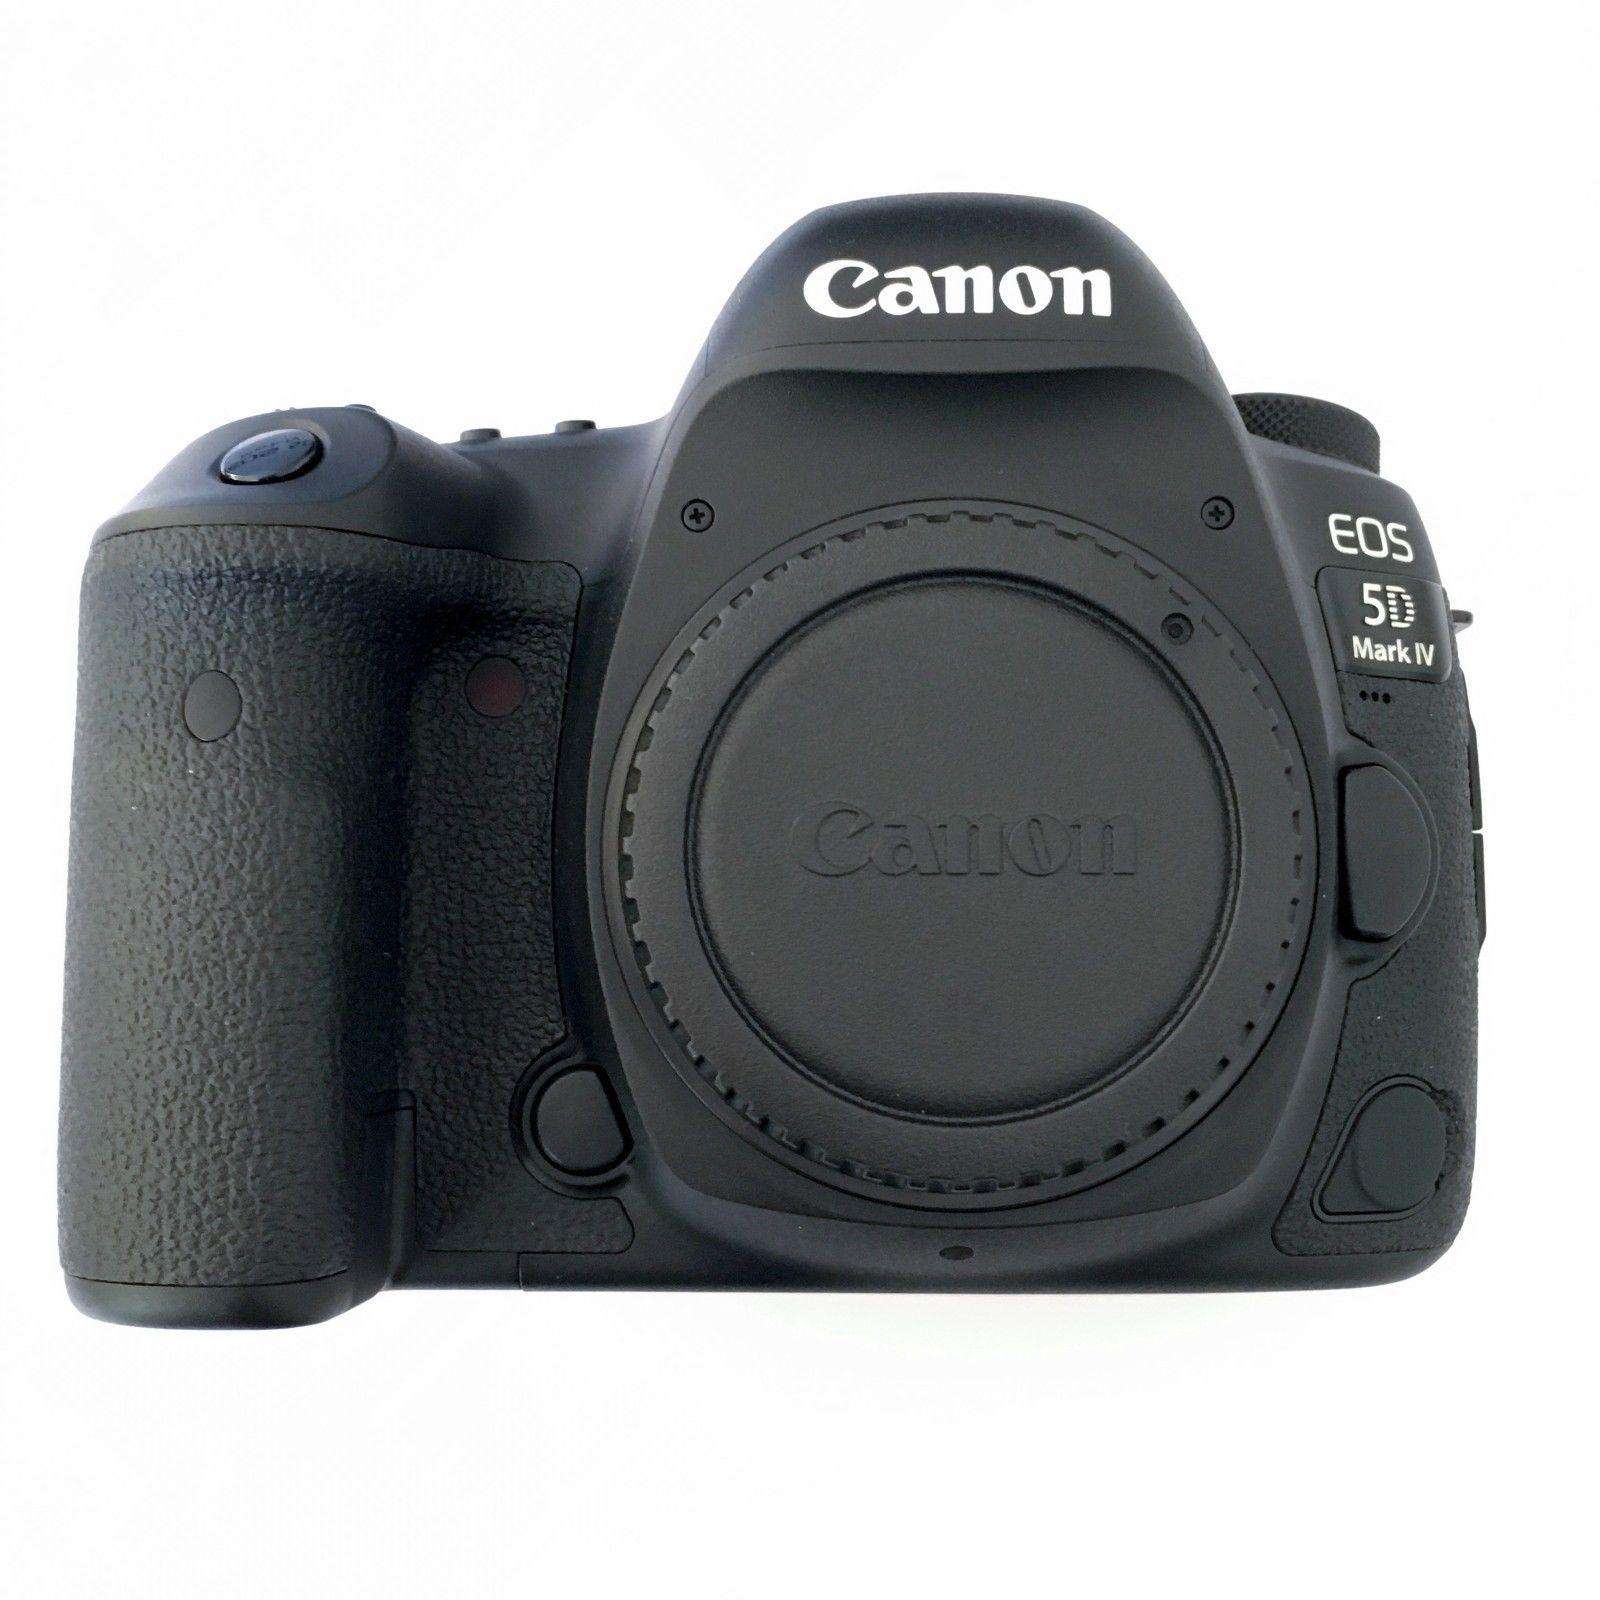 Canon 5D Mark IV 4 Gehäuse Body Digital SLR Kamera DSLR - wie neu / like new!